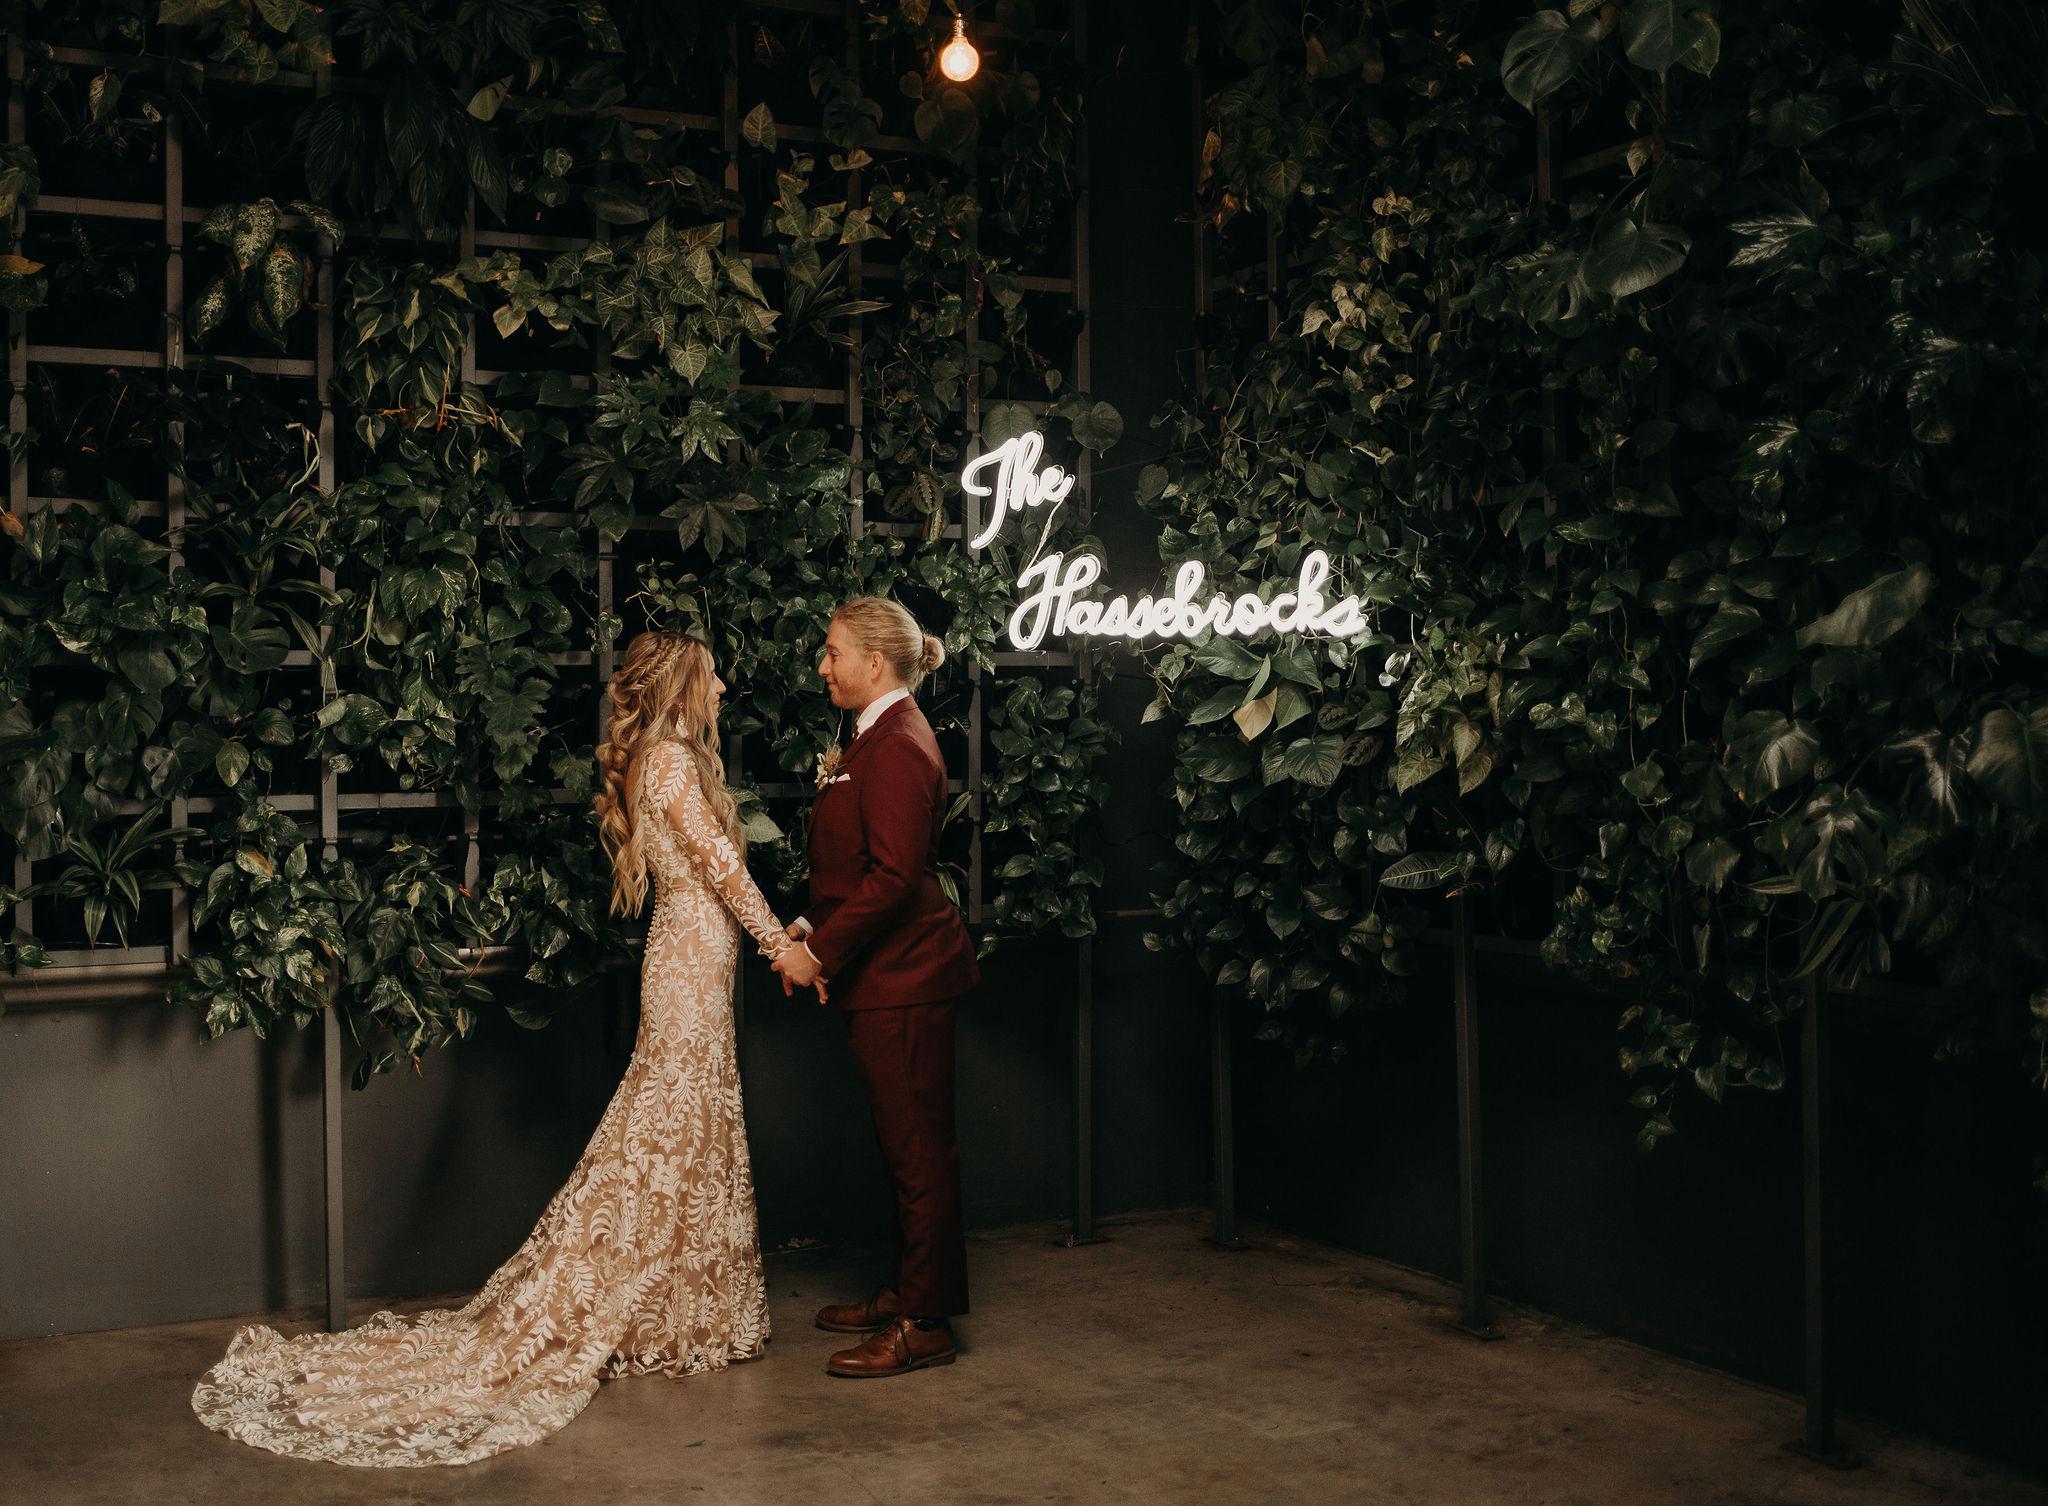 neon wedding sign.jpg